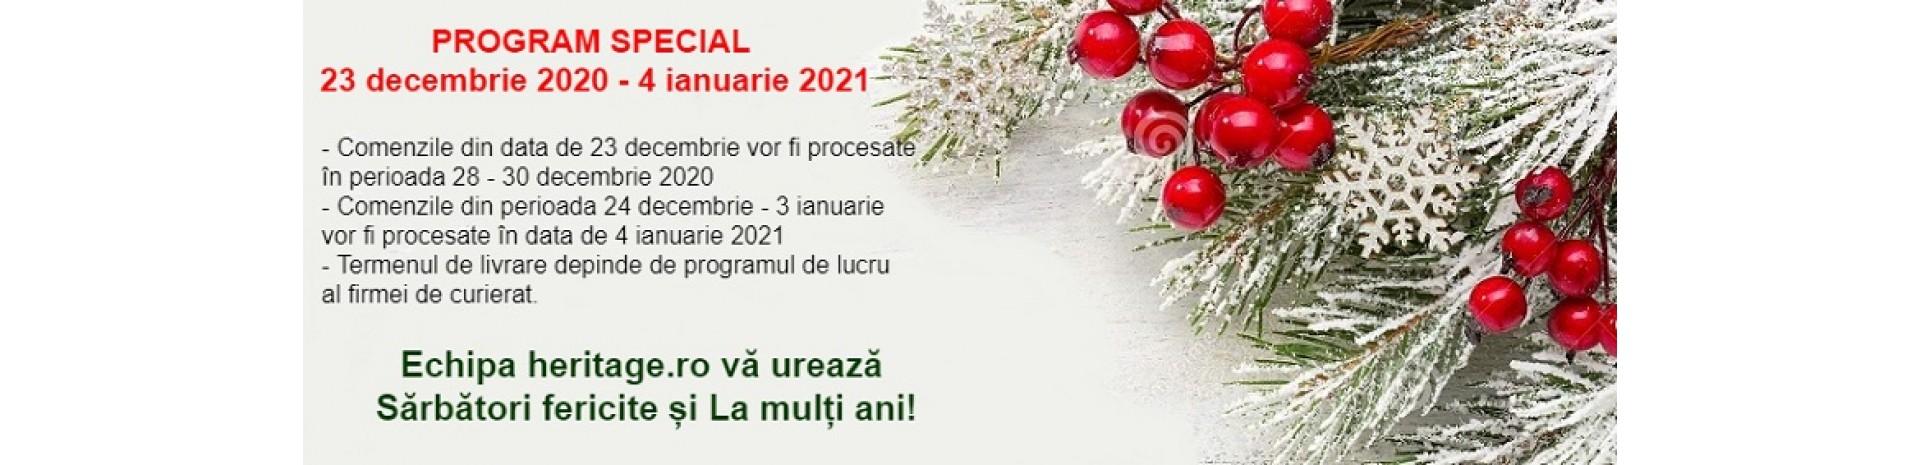 Program sarbatori iarna 2020